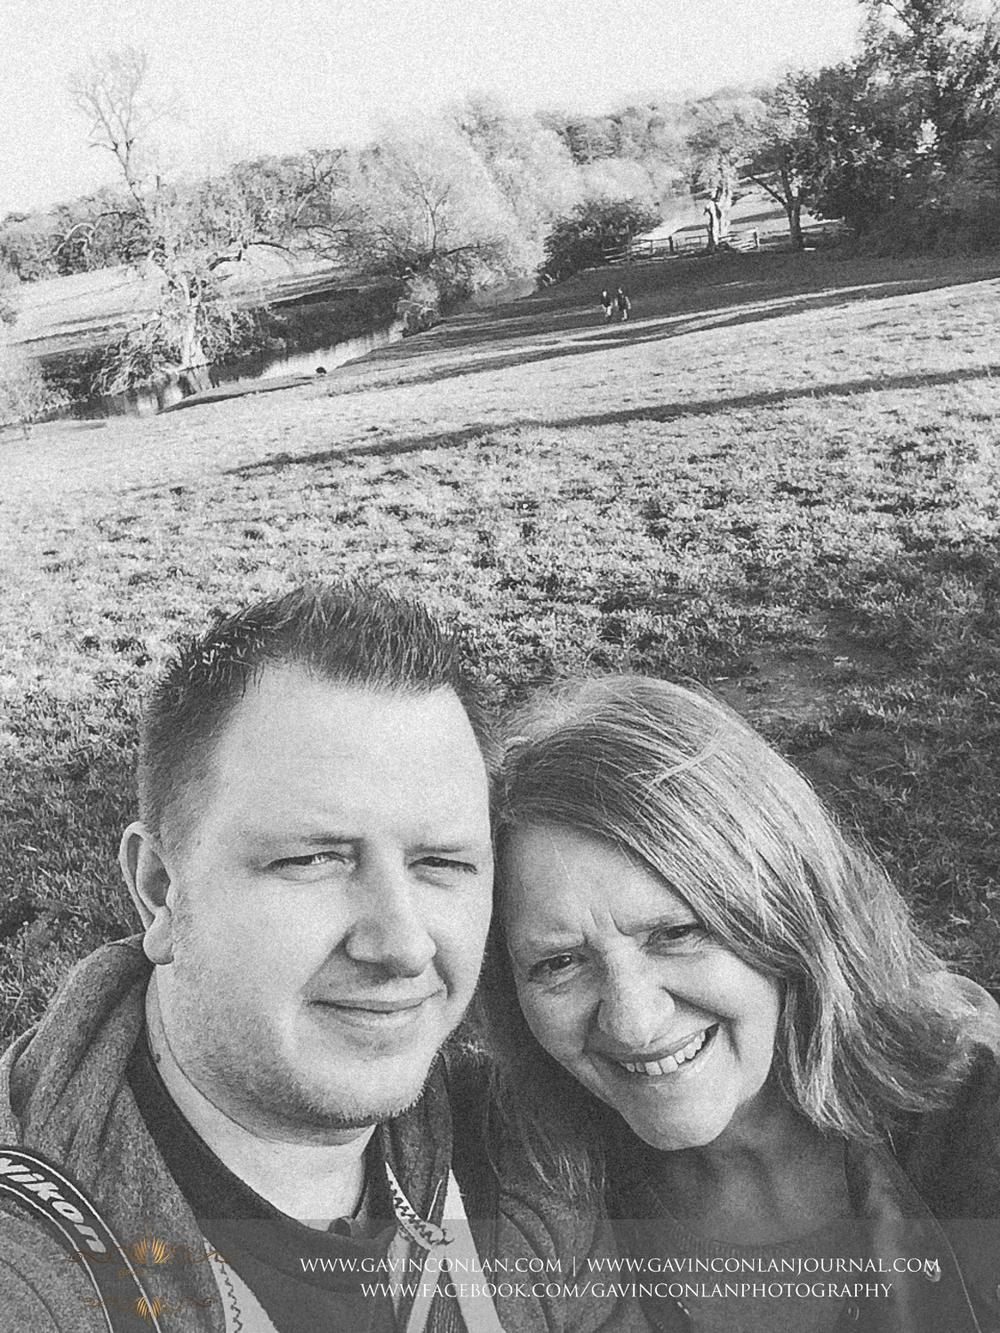 me and mum at Grantchester Meadows, Cambridgeshire